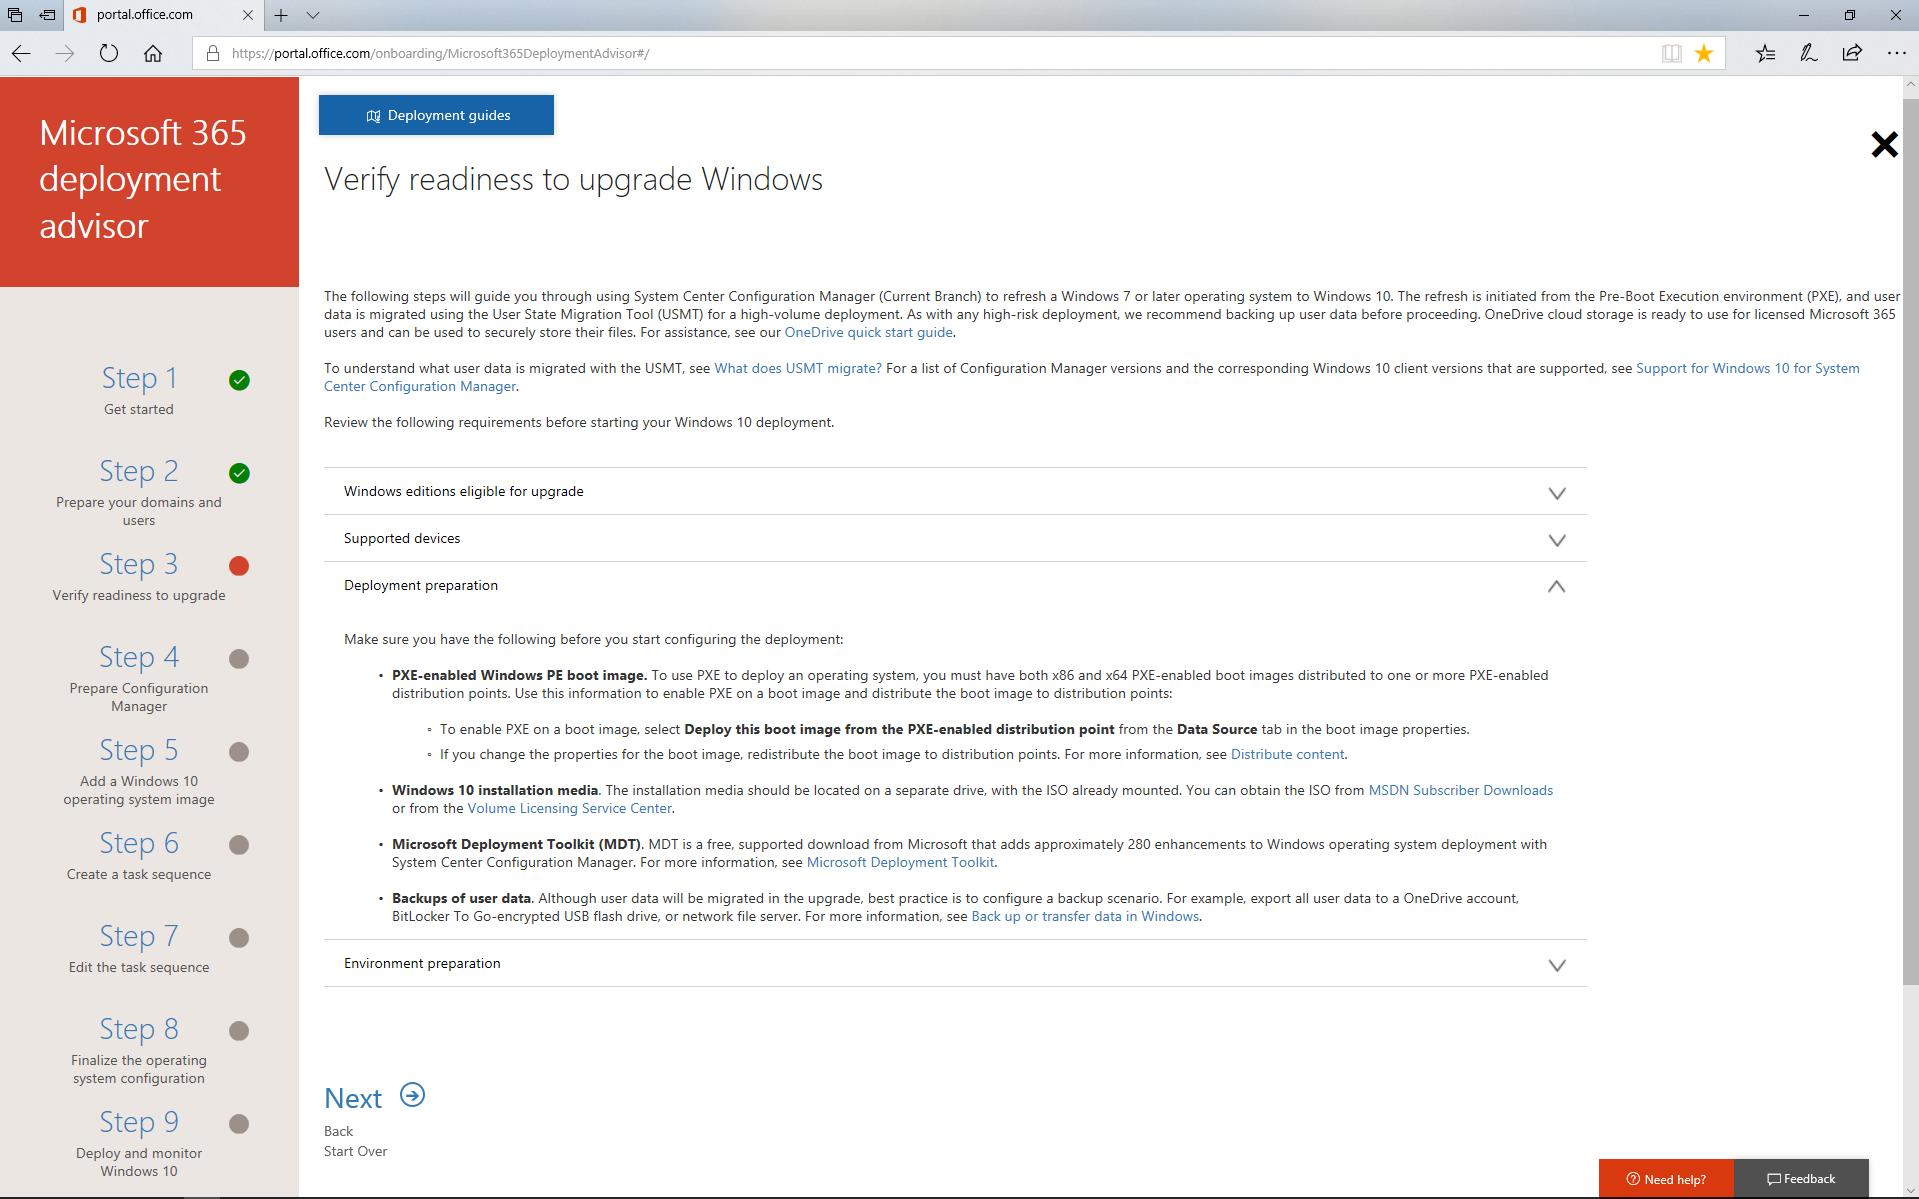 Deploy Windows 10 with Microsoft 365 | Microsoft Docs